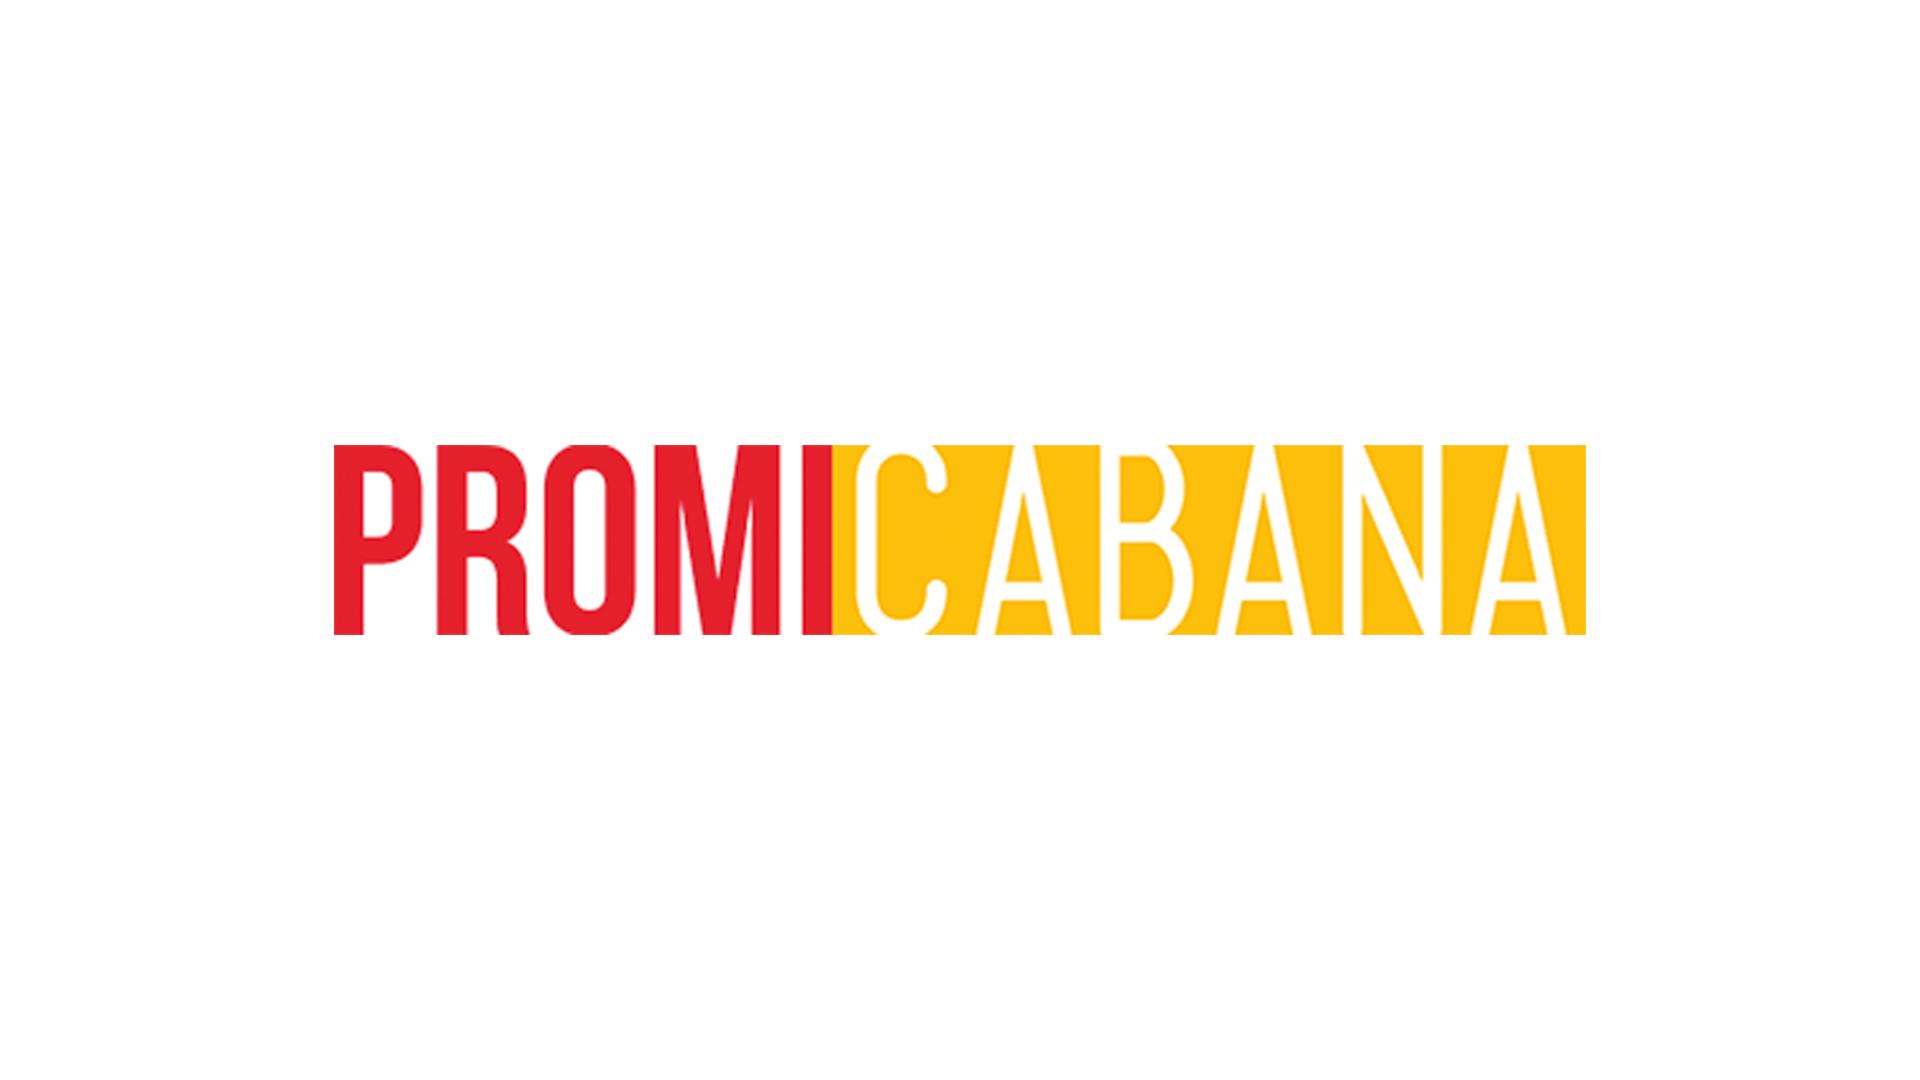 Spice-Girls-Wannabe-James-Franco-Millie-Bobby-Brown-Milo-Ventimiglia